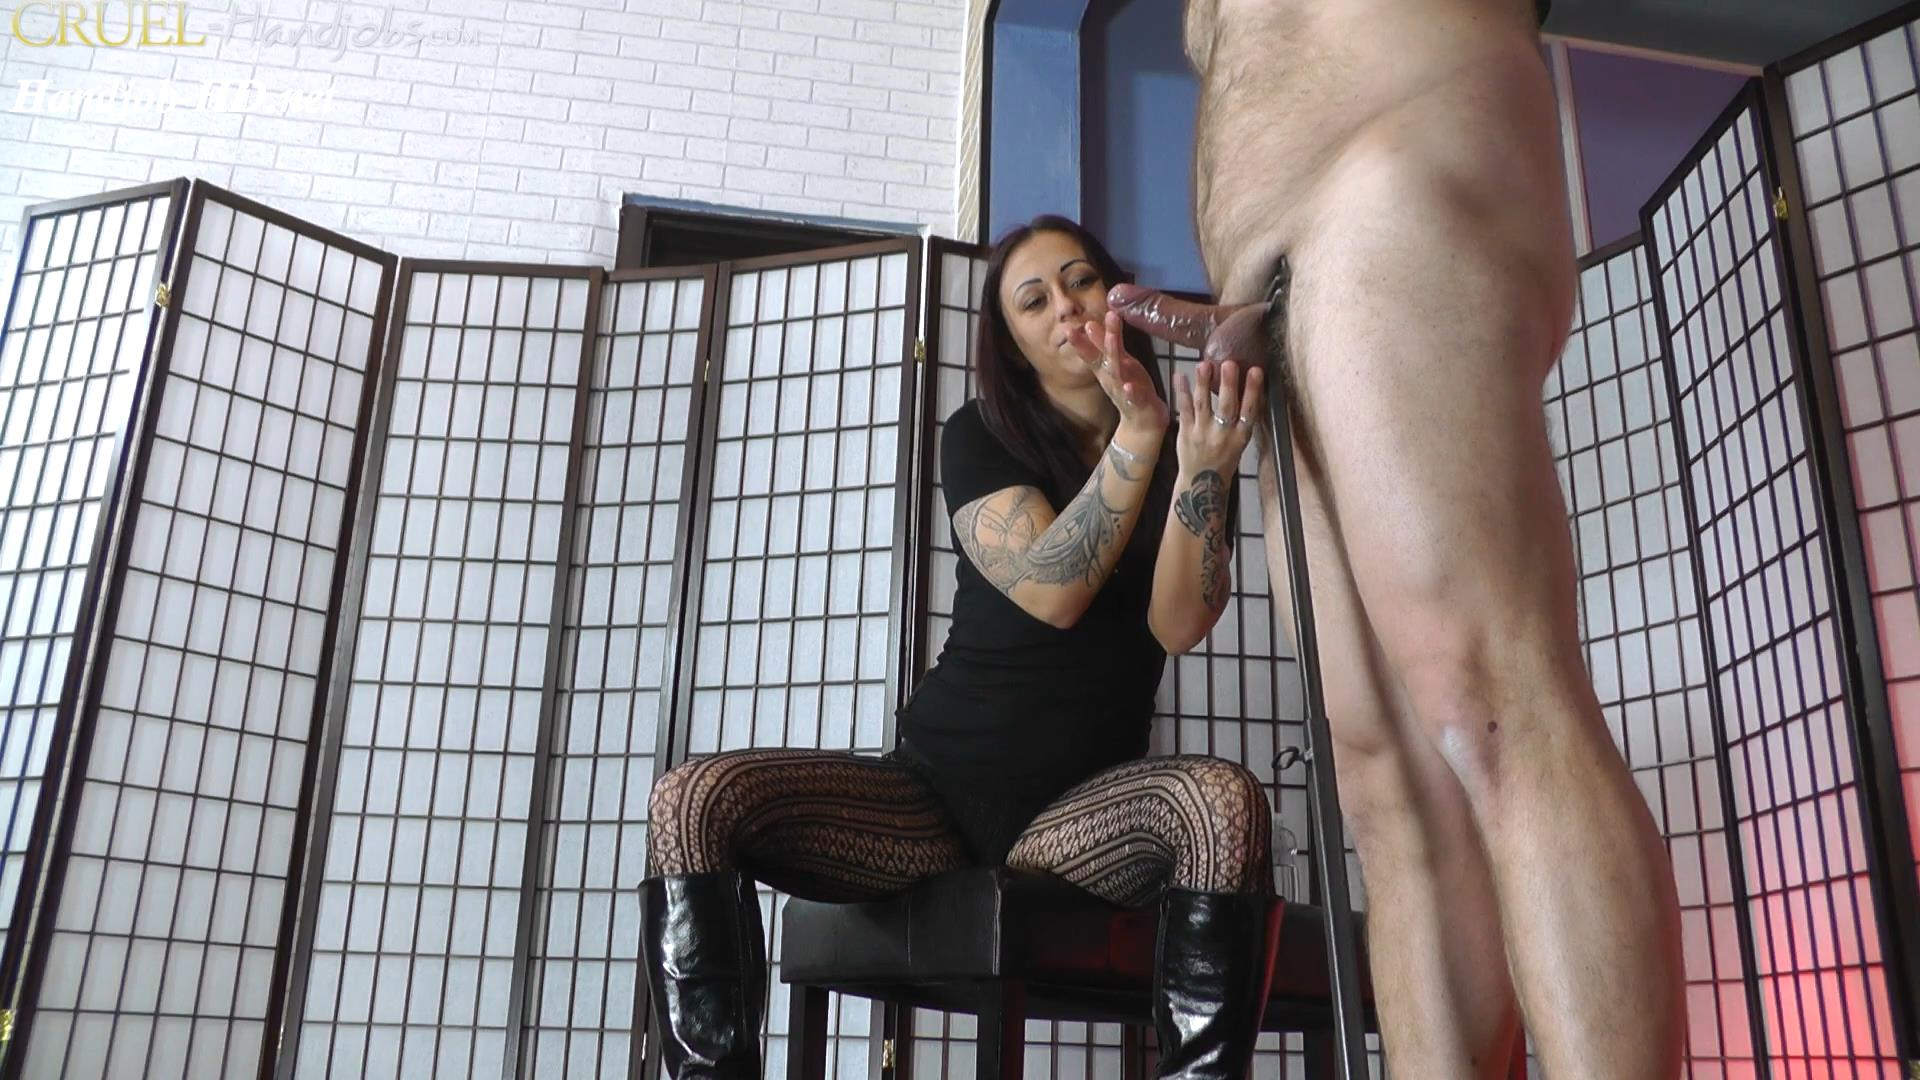 Milked_by_Mistress_Sophie_-_Cruel_Handjobs.jpg